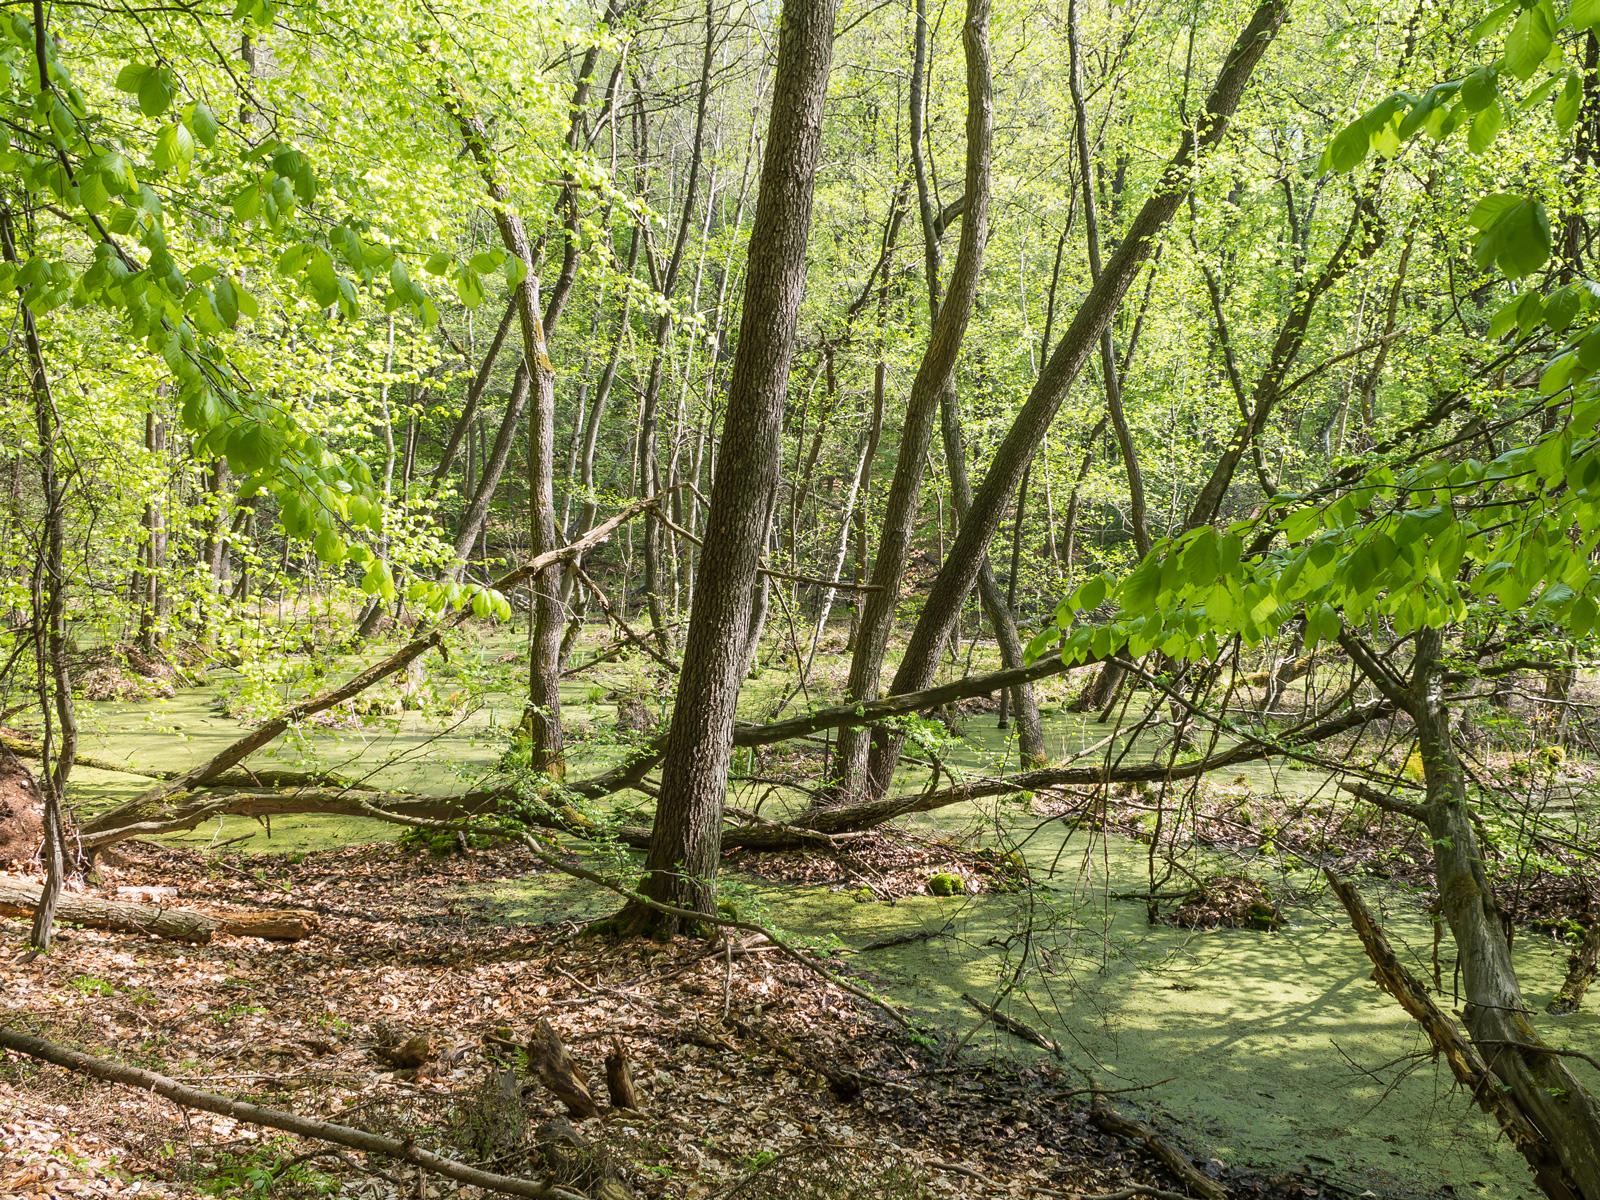 Erlen-Sumpfwald im Verlandungsmoor